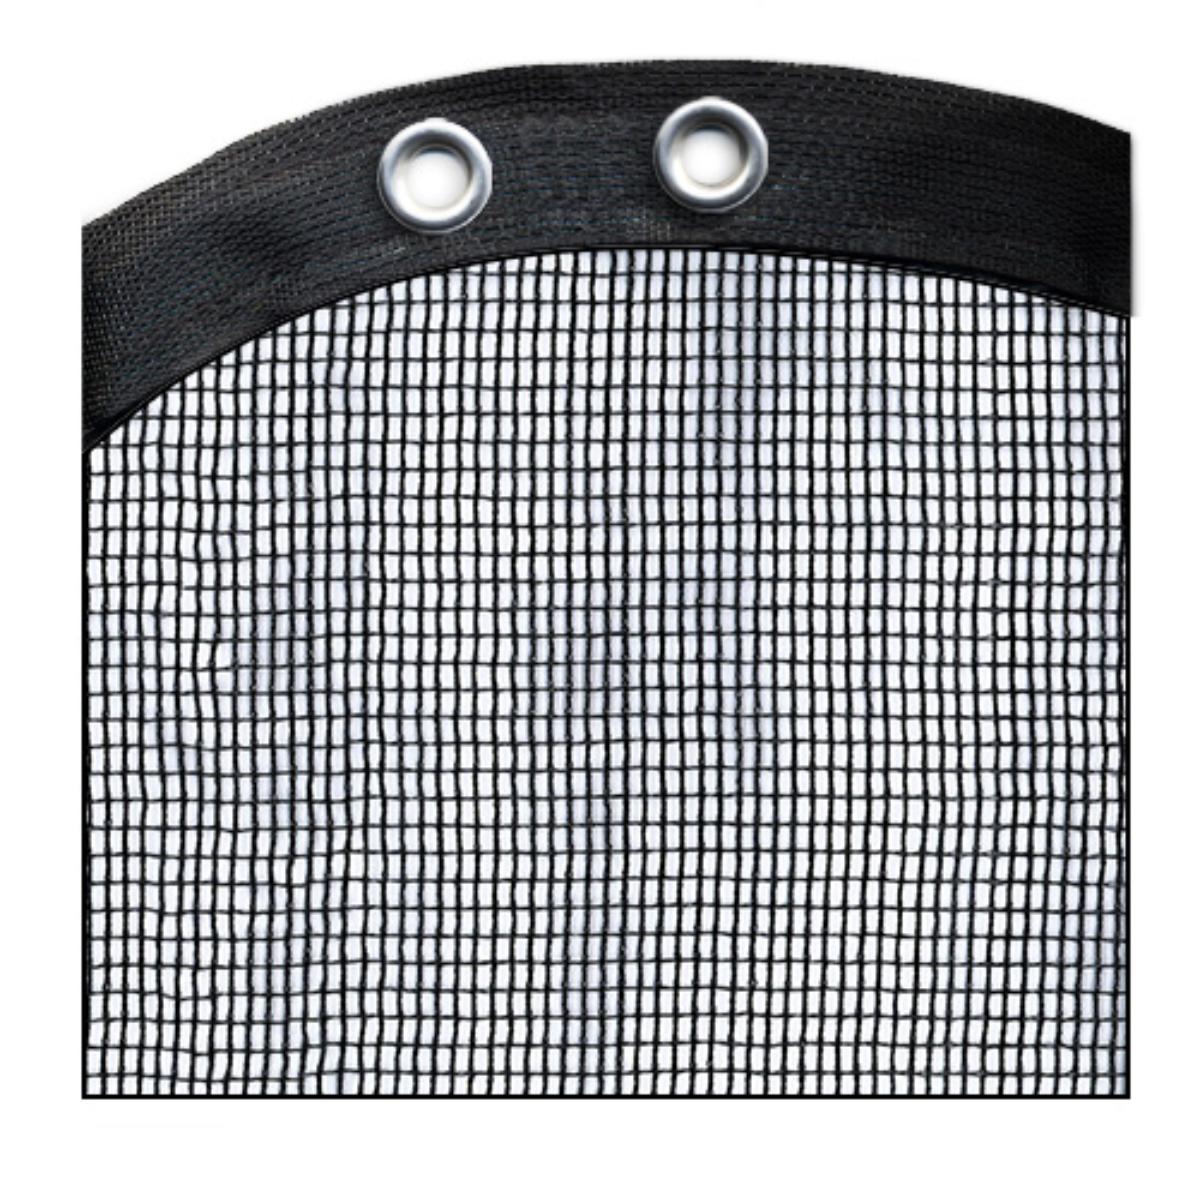 Robelle Premium 28 39 Round Above Ground Swimming Pool Leaf Net Cover Black Picclick